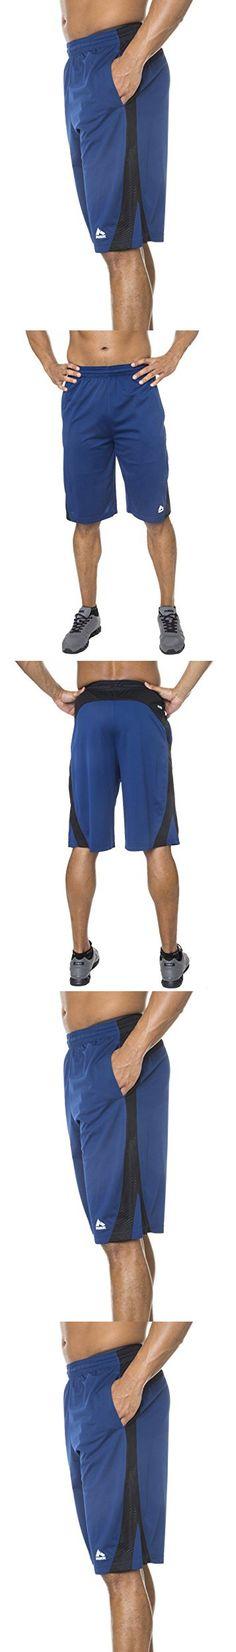 RBX Active Men's Tech Fusion Novelty Basketball Short